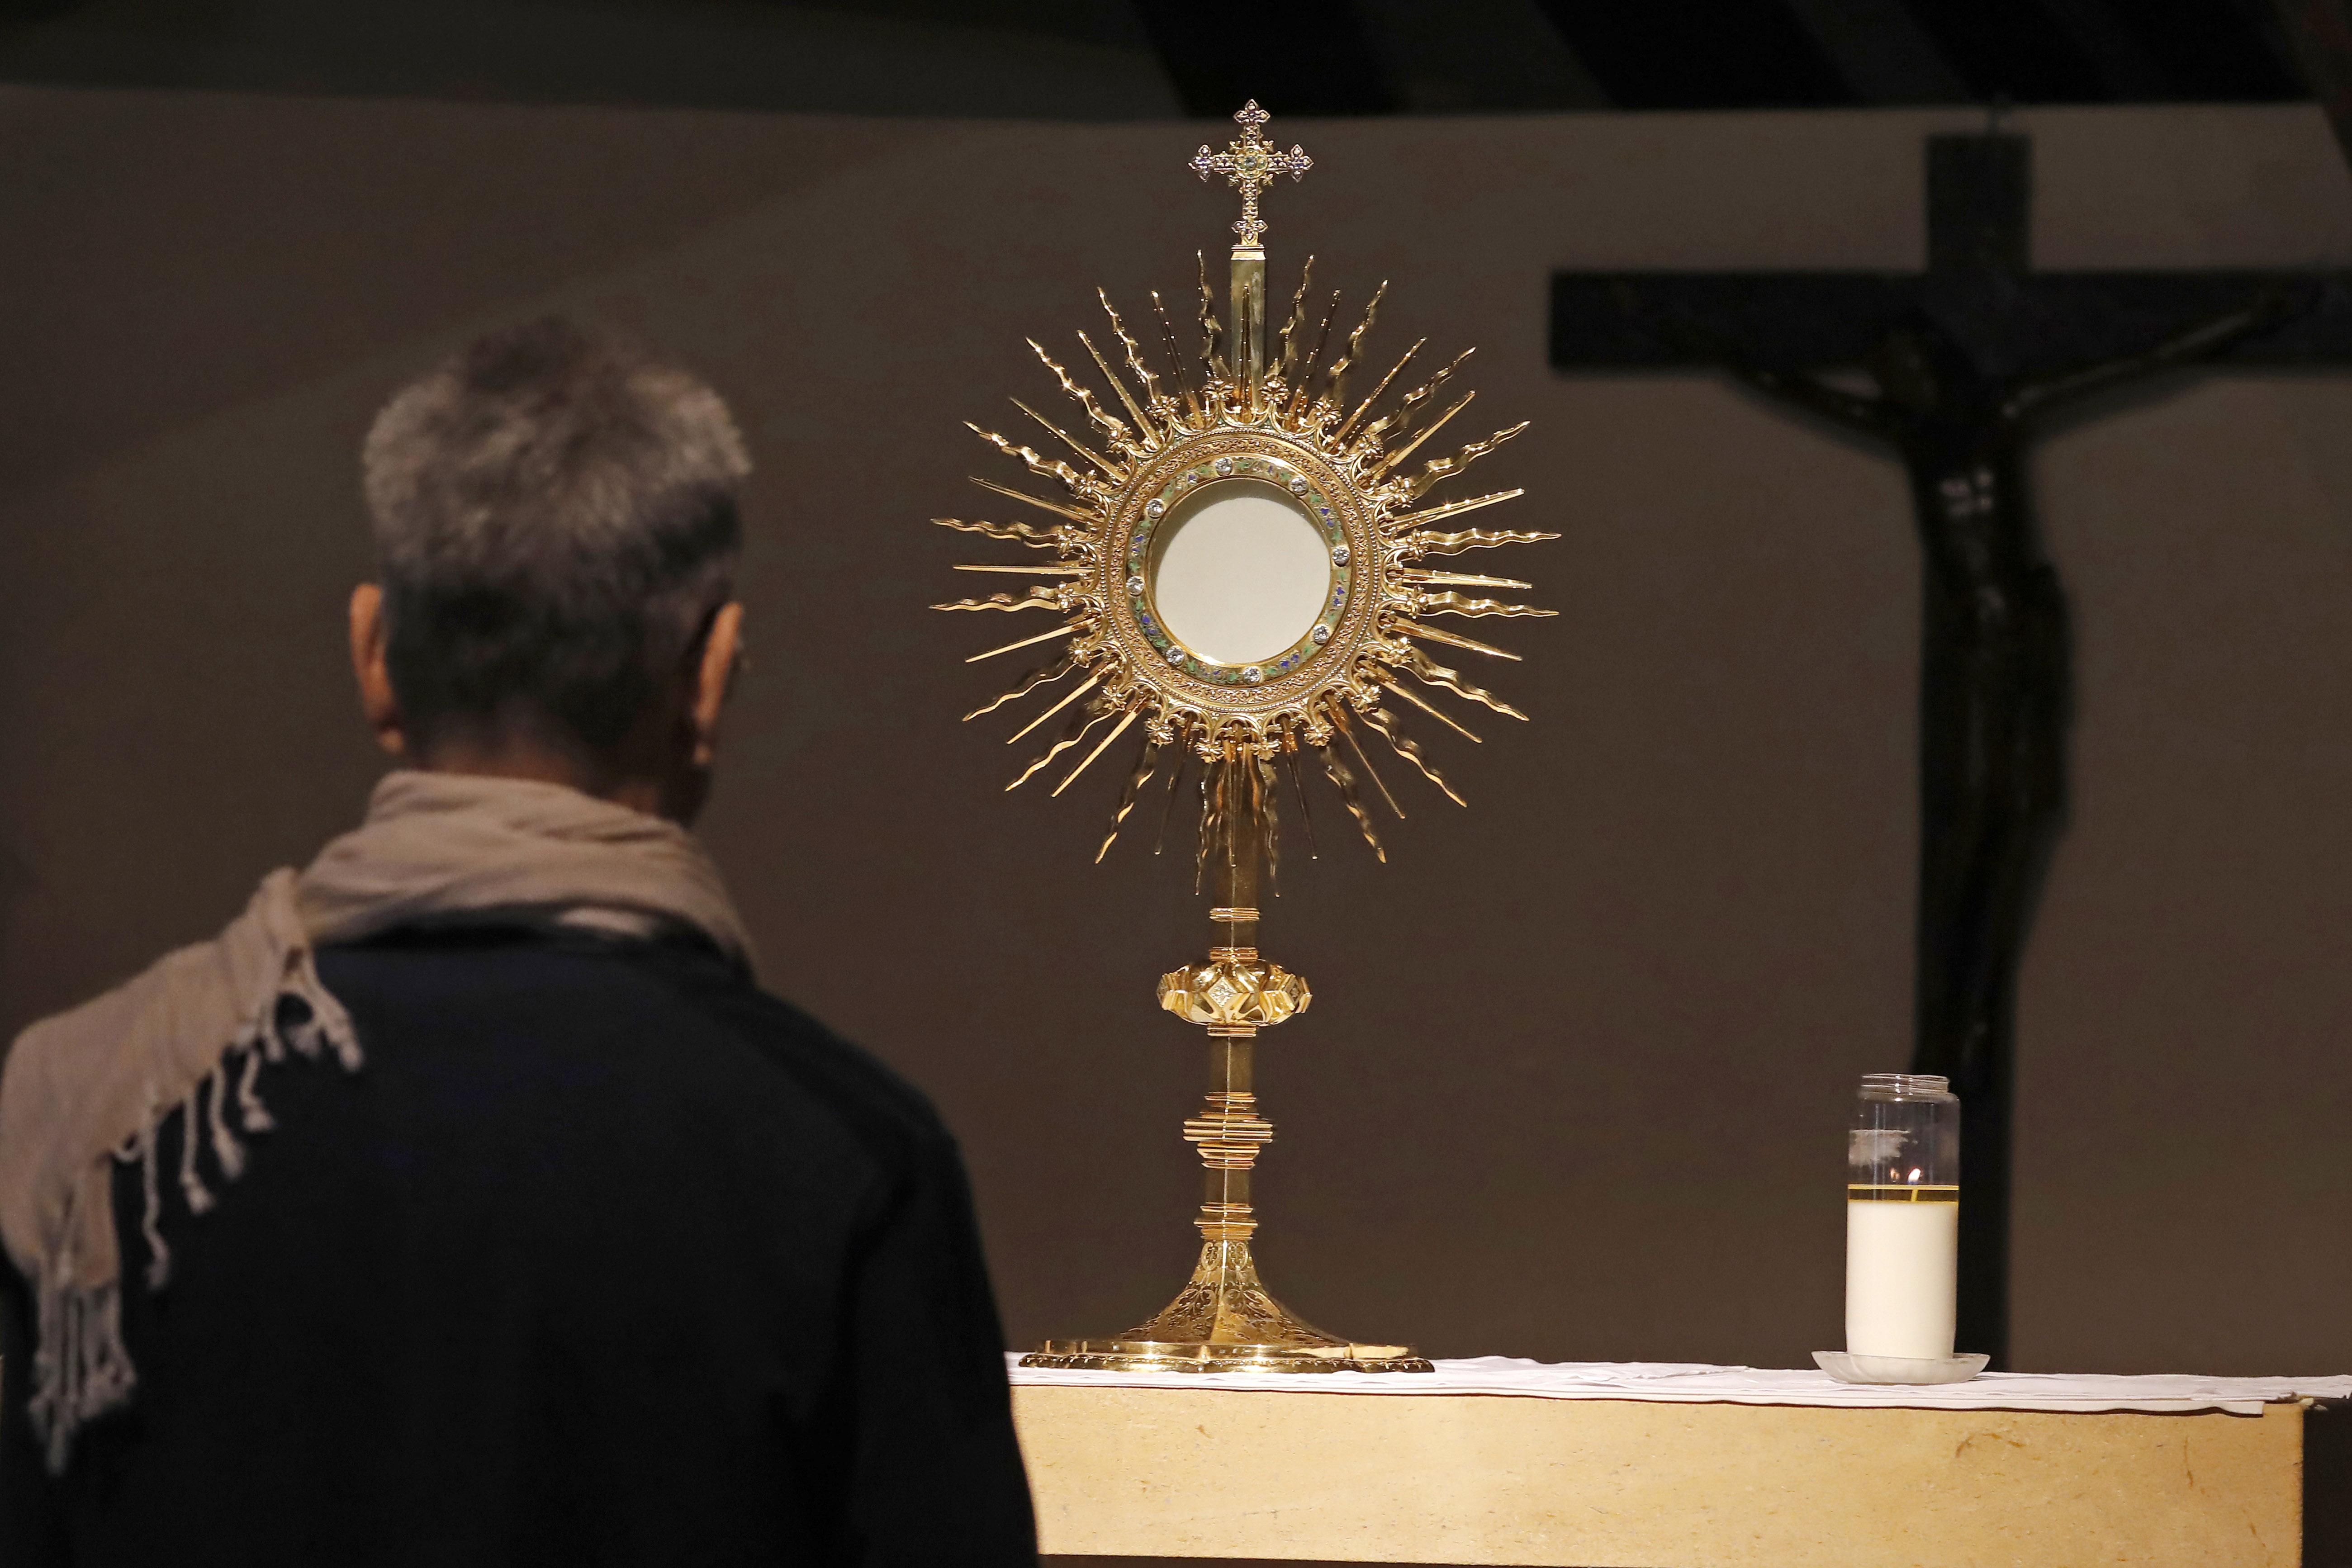 Adoration eucharistique Paray le Monial